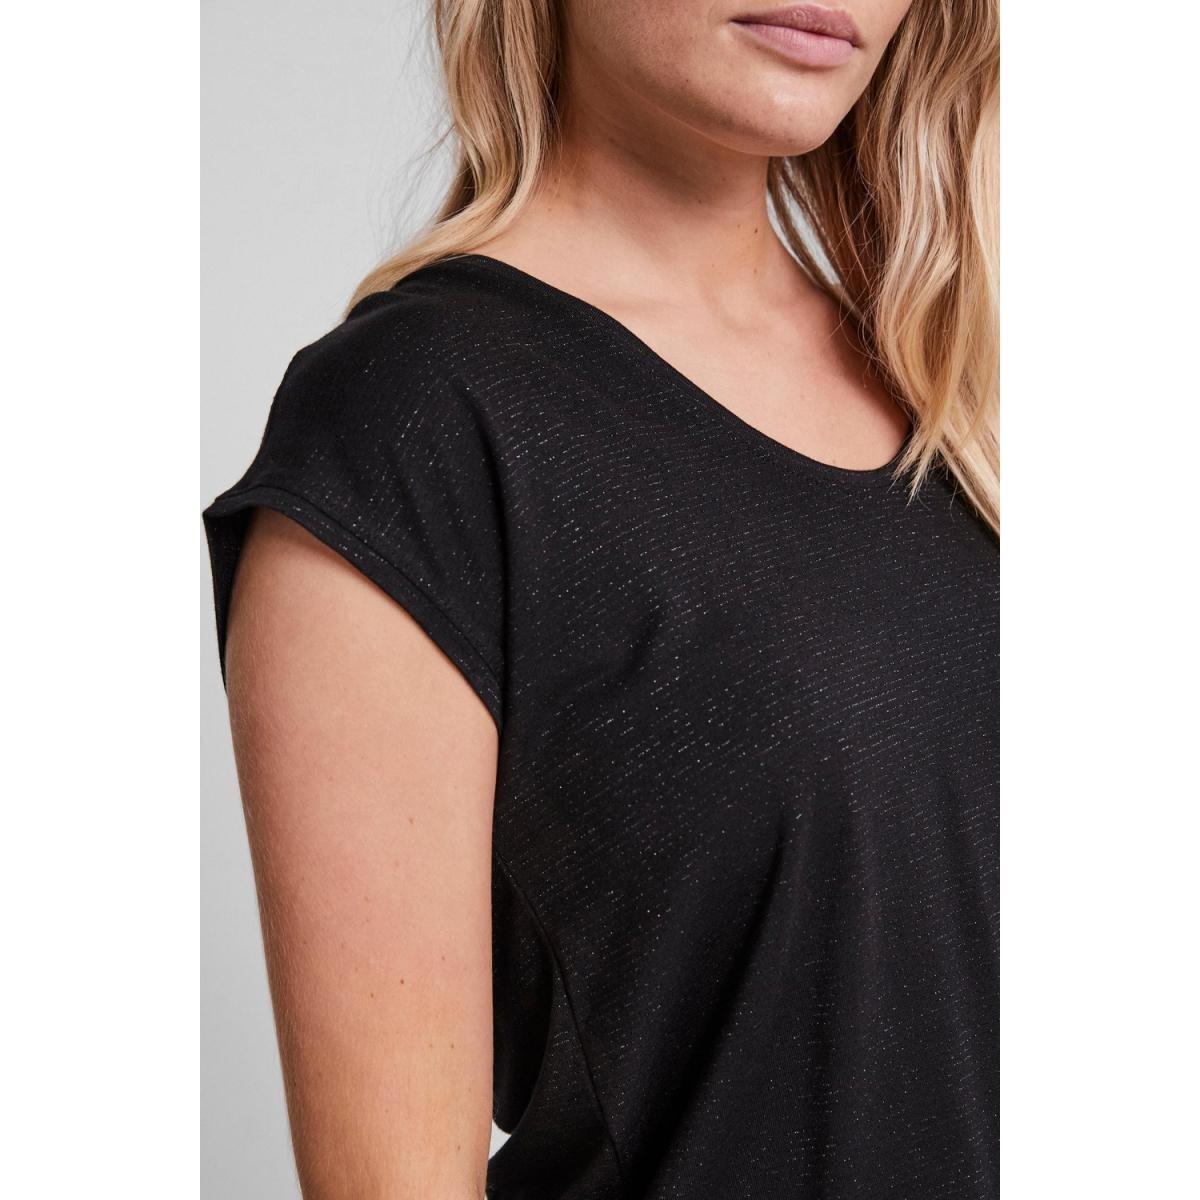 pcbillo tee lurex stripes noos 17078572 pieces t-shirt black/ lurex black